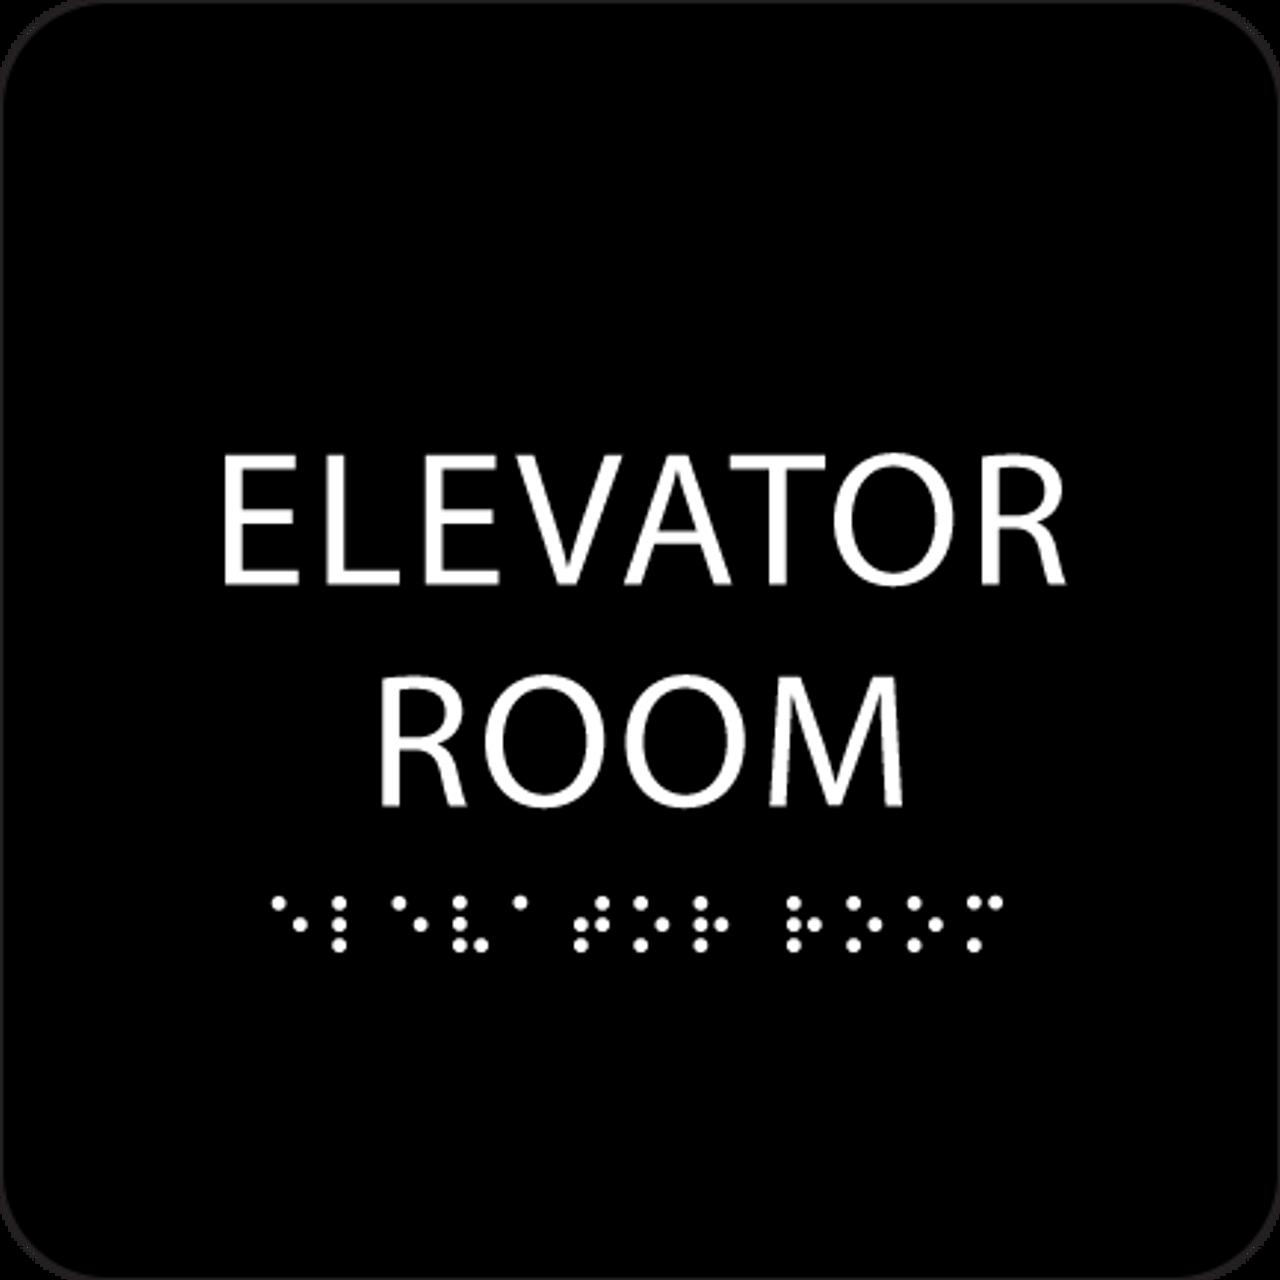 Black Elevator Room ADA Sign